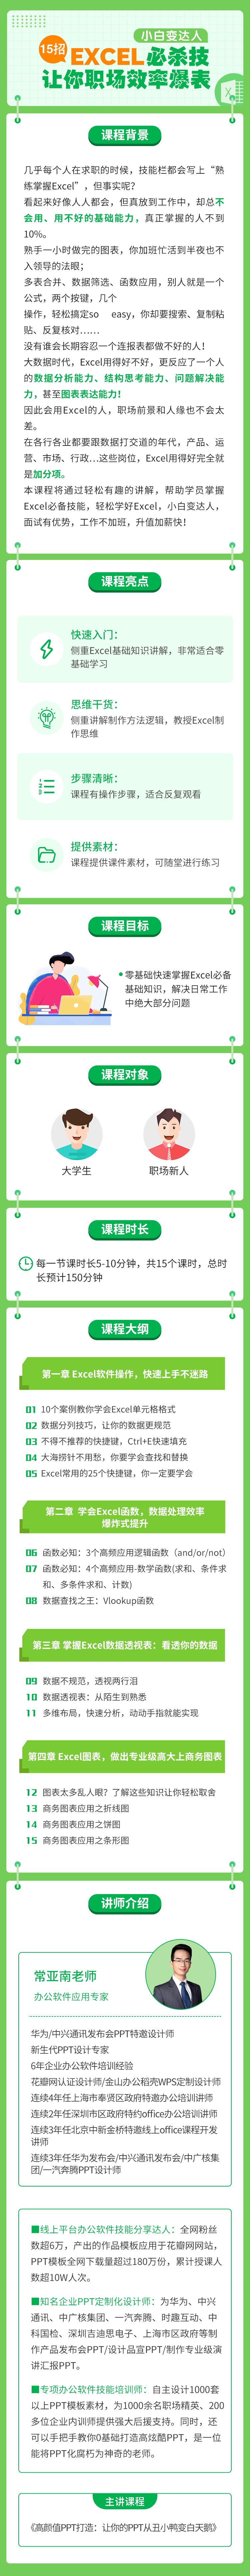 https://hs-1251609649.cos.ap-guangzhou.myqcloud.com/newhdp%2Flive_cover%2F4239%2F5149e1bcc83d9040dcf54a24a7d0b33a.png